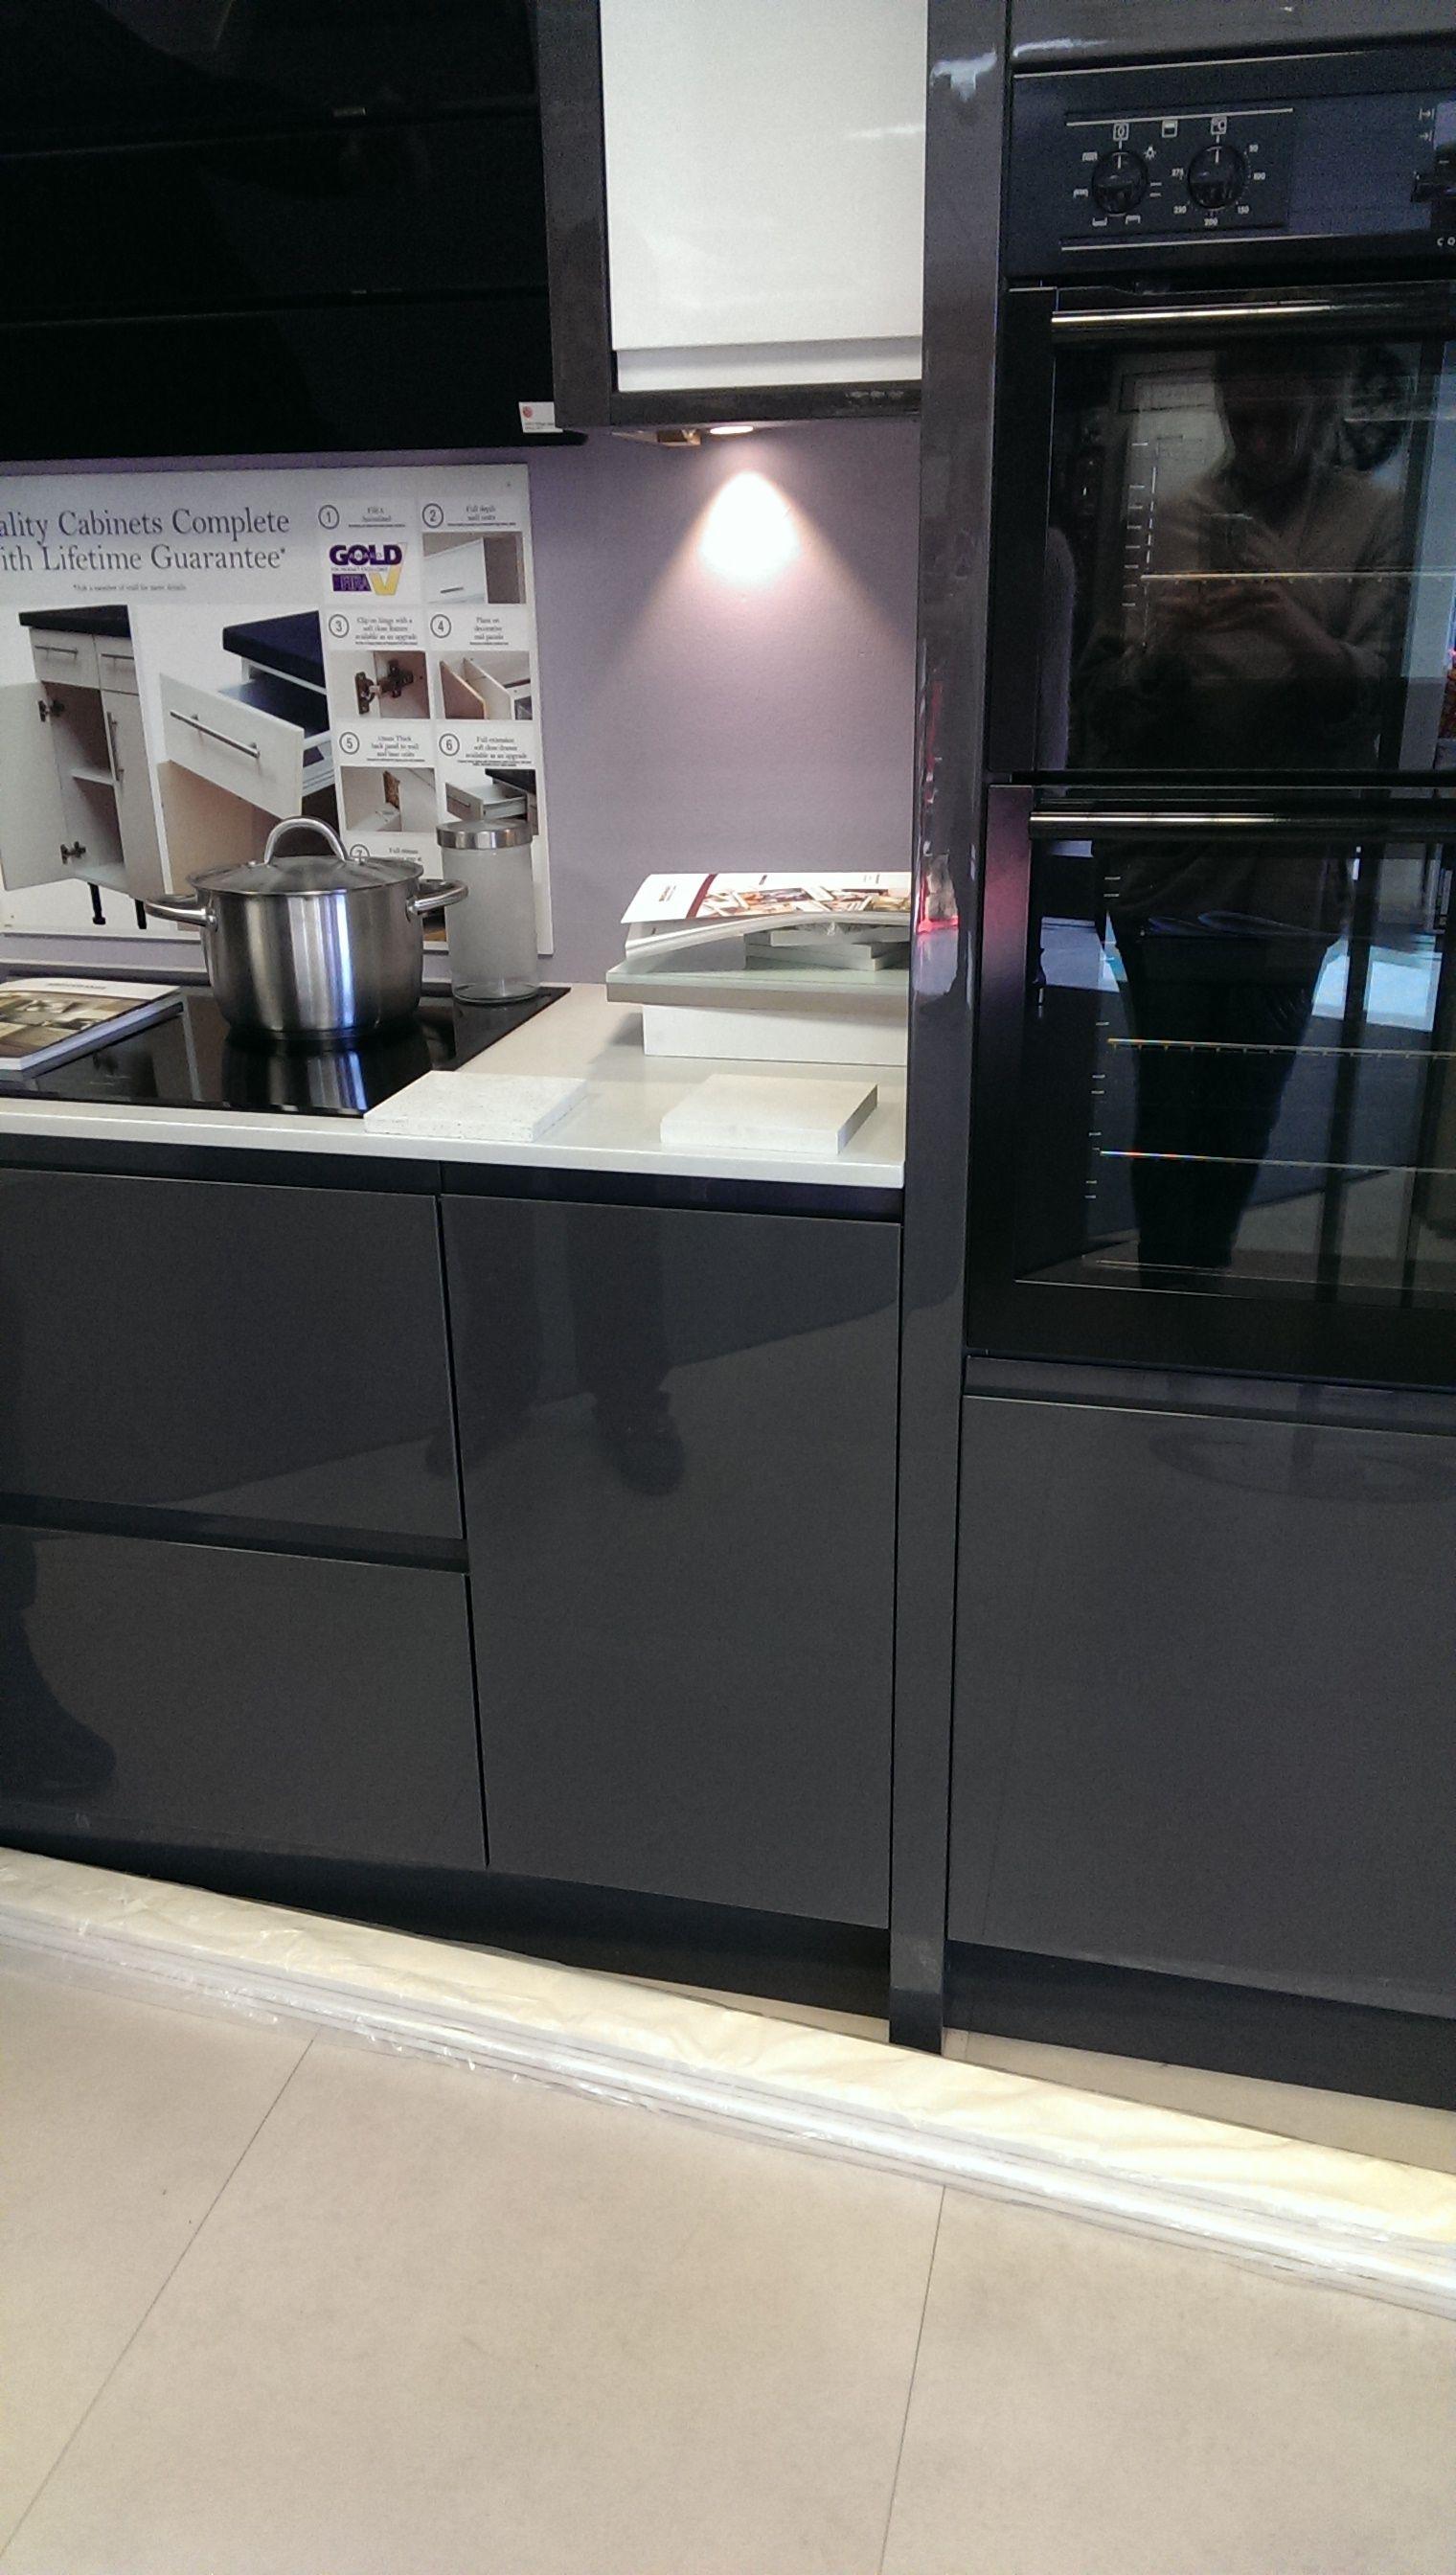 Benchmarx holboln grey kitchen showroom Kitchen showroom